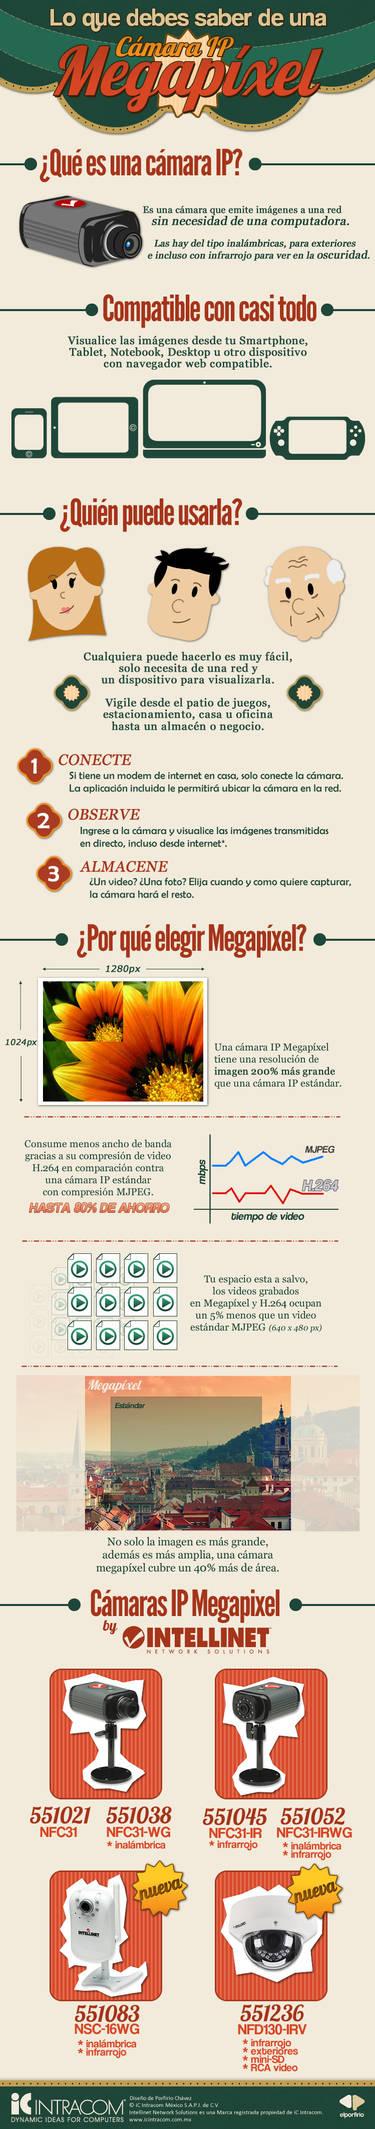 Infografia Camaras IP Megapixel